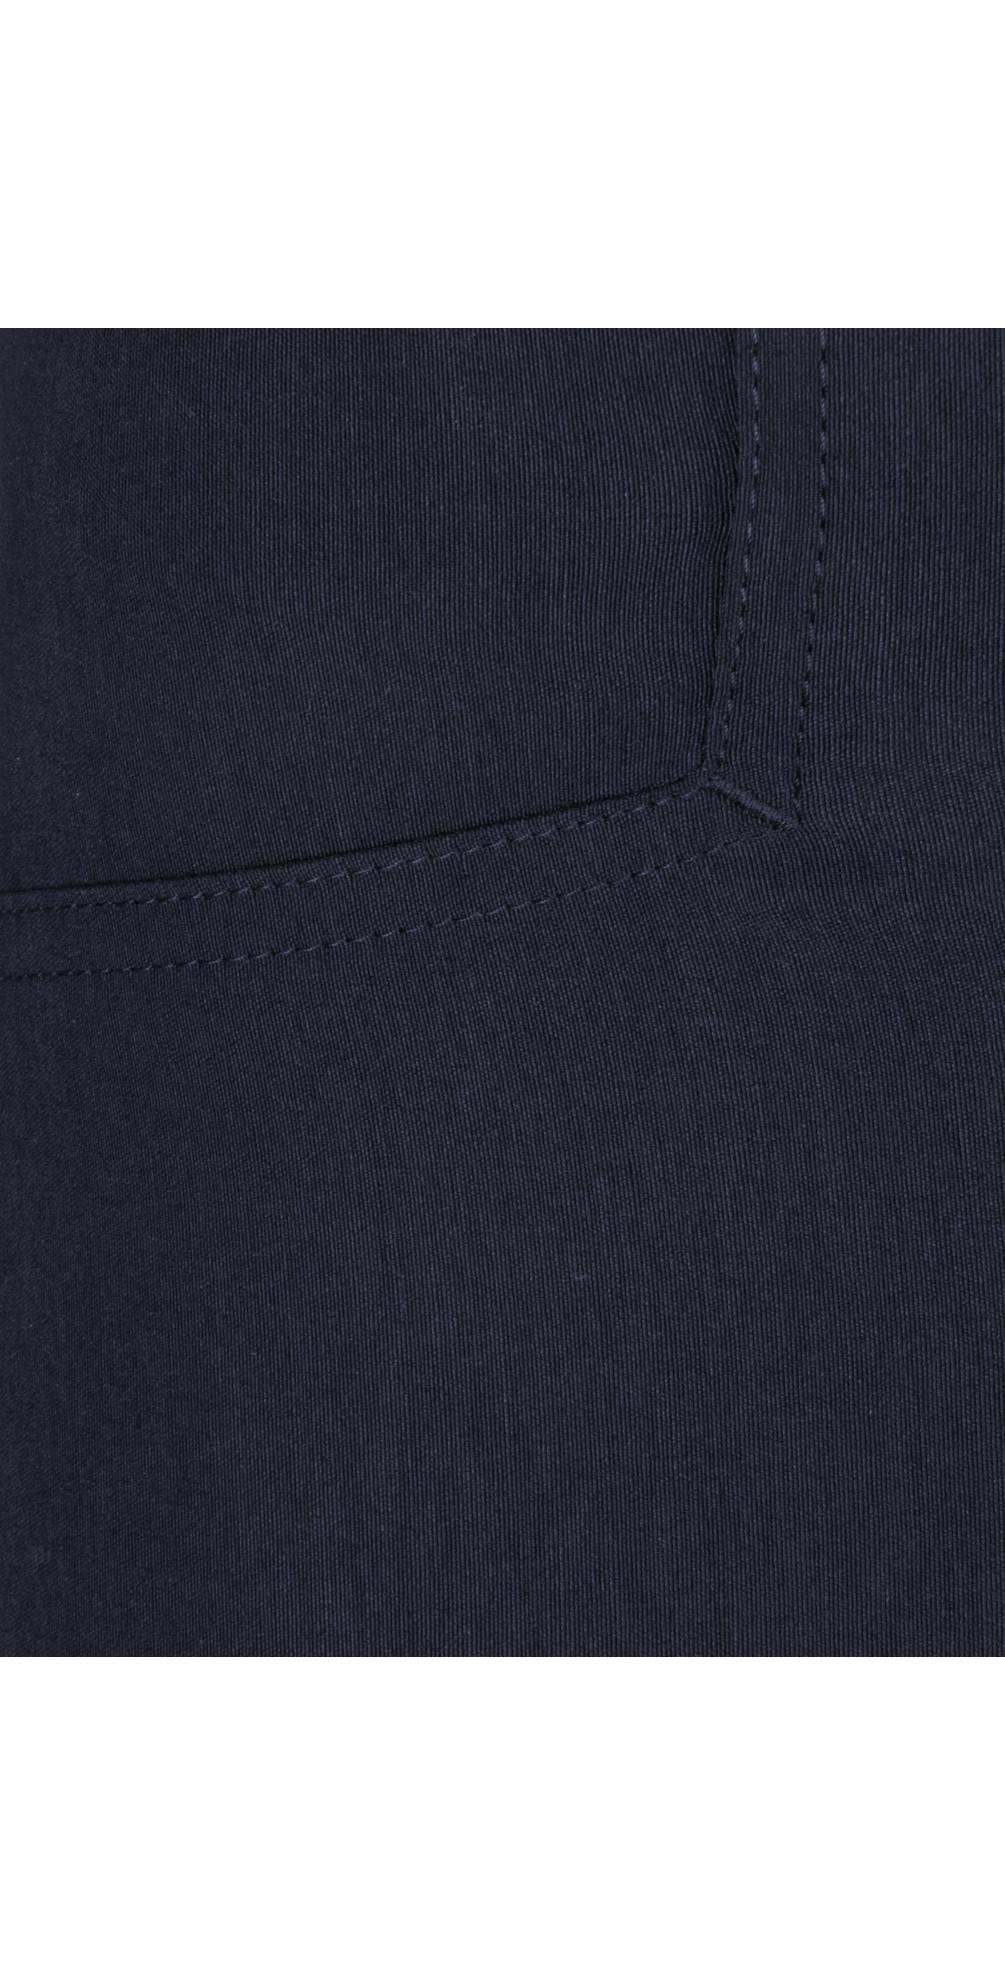 Rose 09 7/8 Narrow Cropped Trouser main image